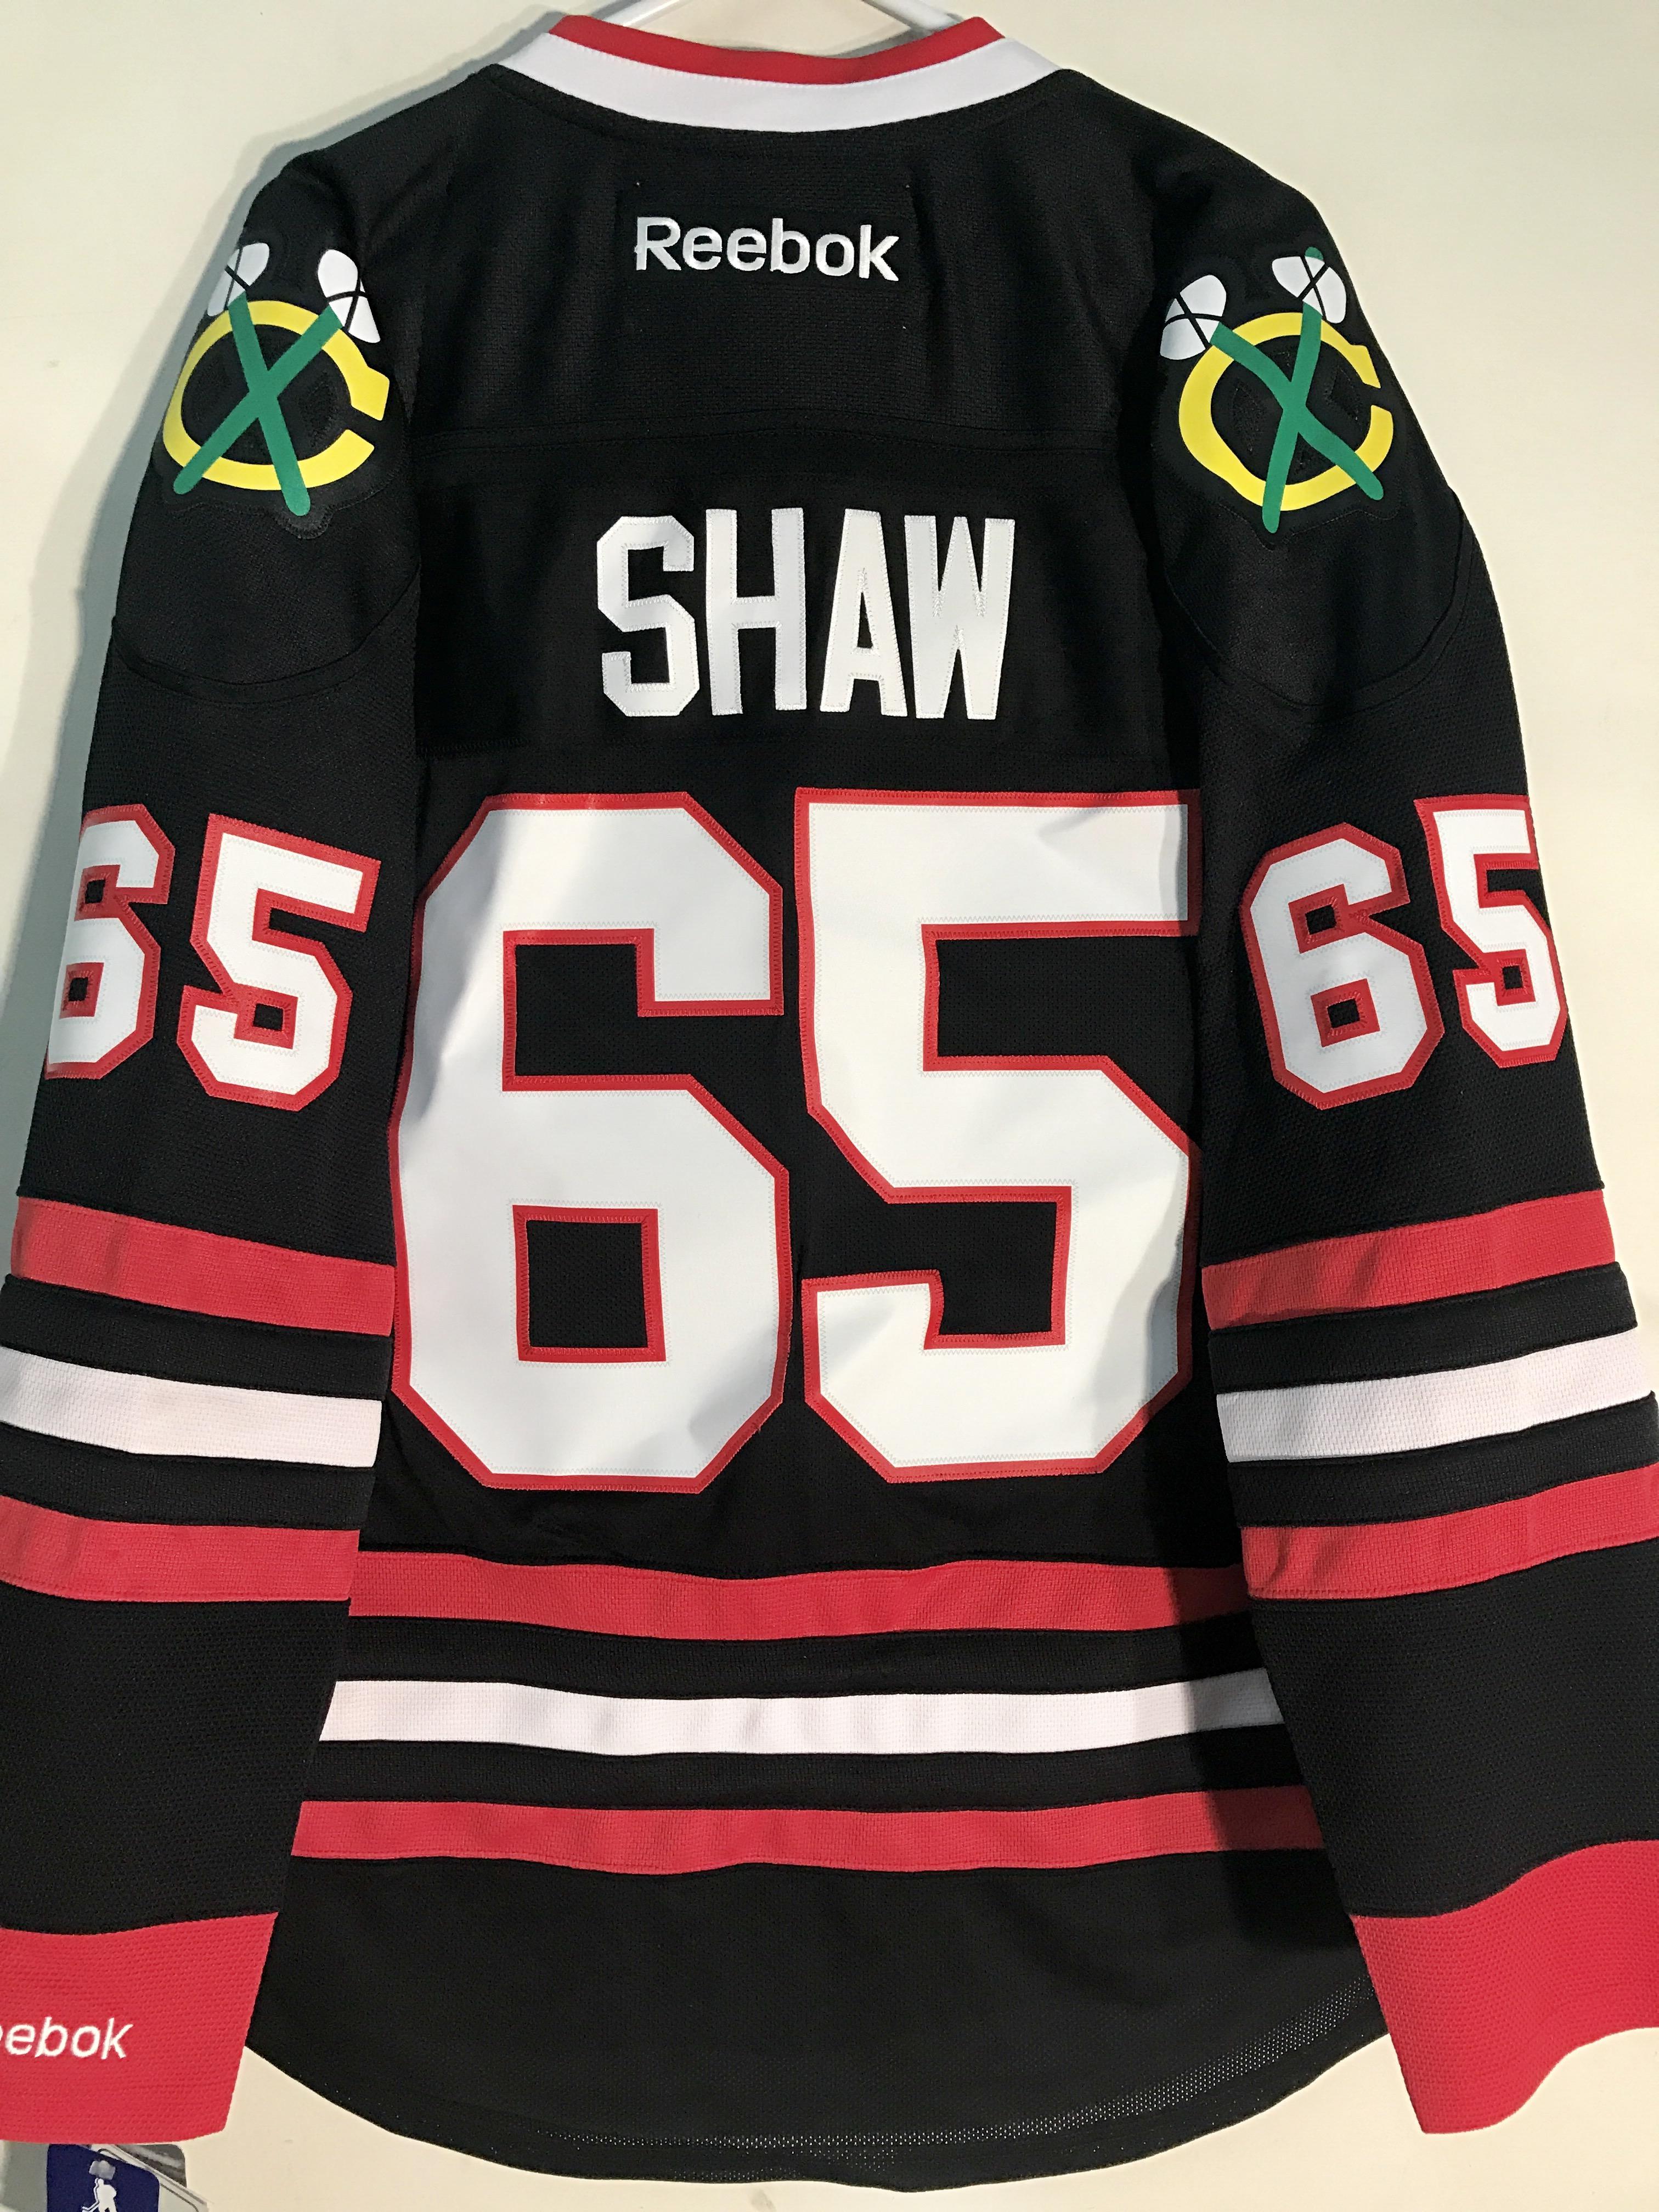 low priced 46ab1 d606b Details about Reebok Premier NHL Jersey Chicago Blackhawks Andrew Shaw  Black Alt sz XL